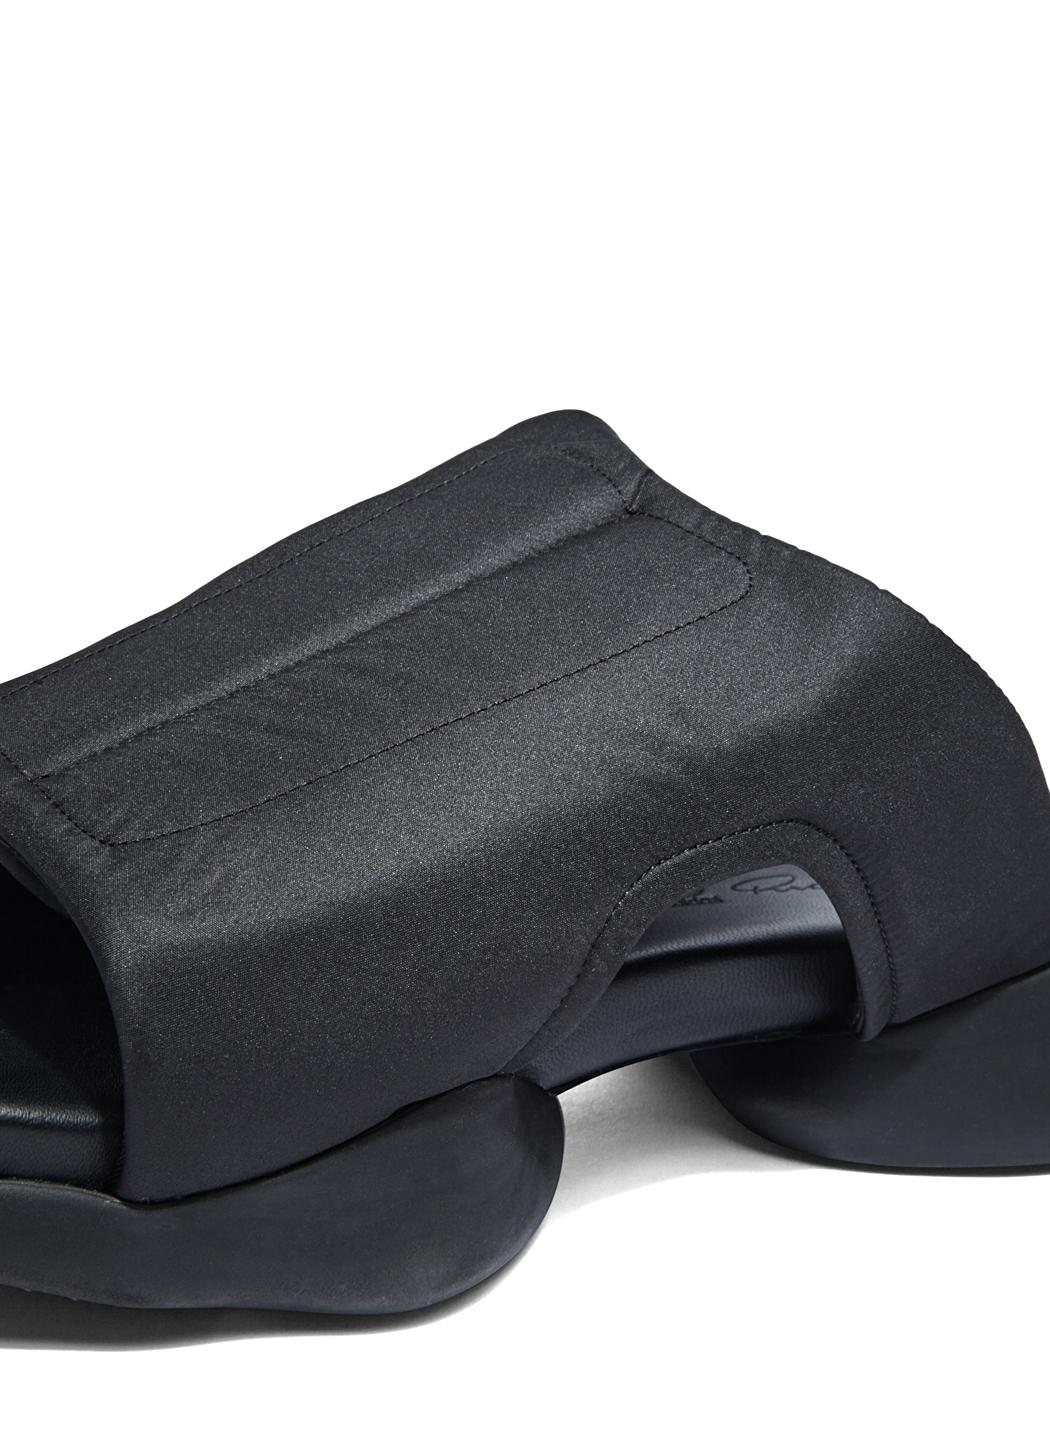 d529cb4bdebe0 Lyst - Rick Owens X Adidas Men s Velcro Strap Ro Clog Sandals In ...